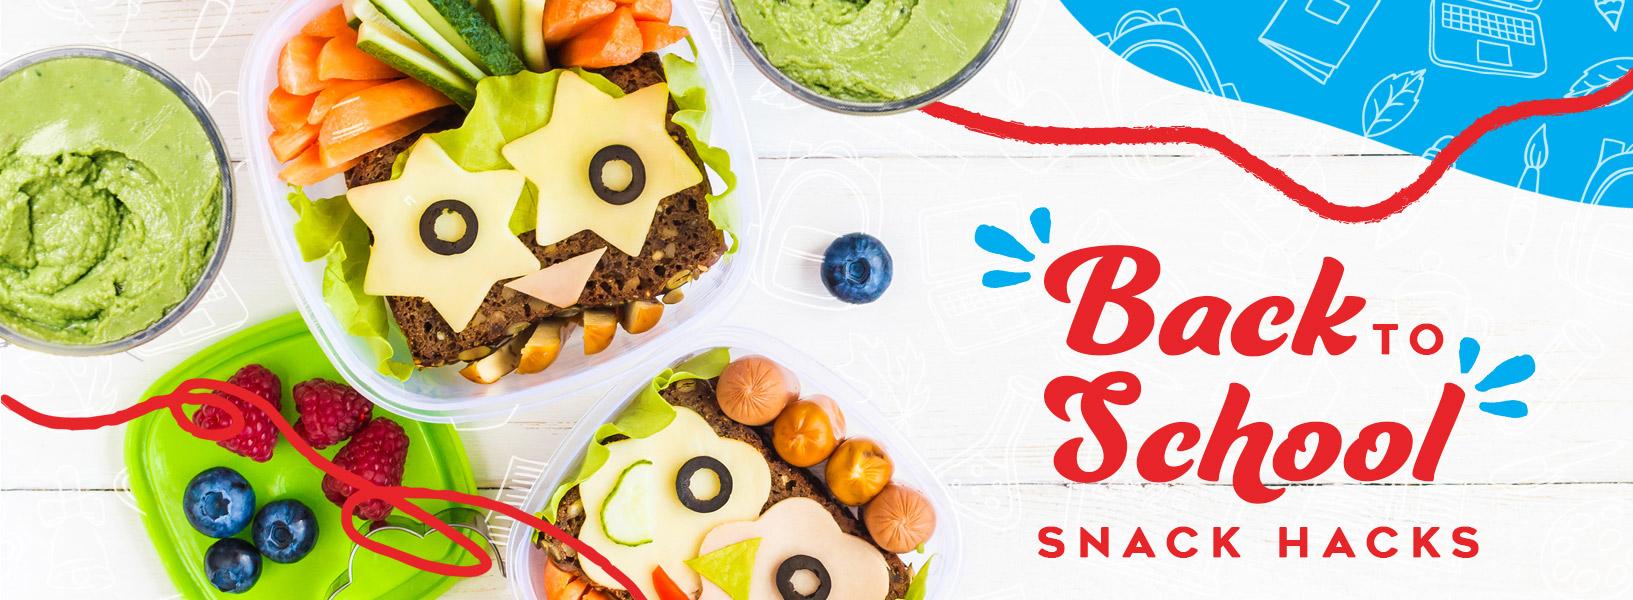 Back to School Snacks | Lunchbox-Ready Snacks | ¡Yo Quiero!™️ Brands